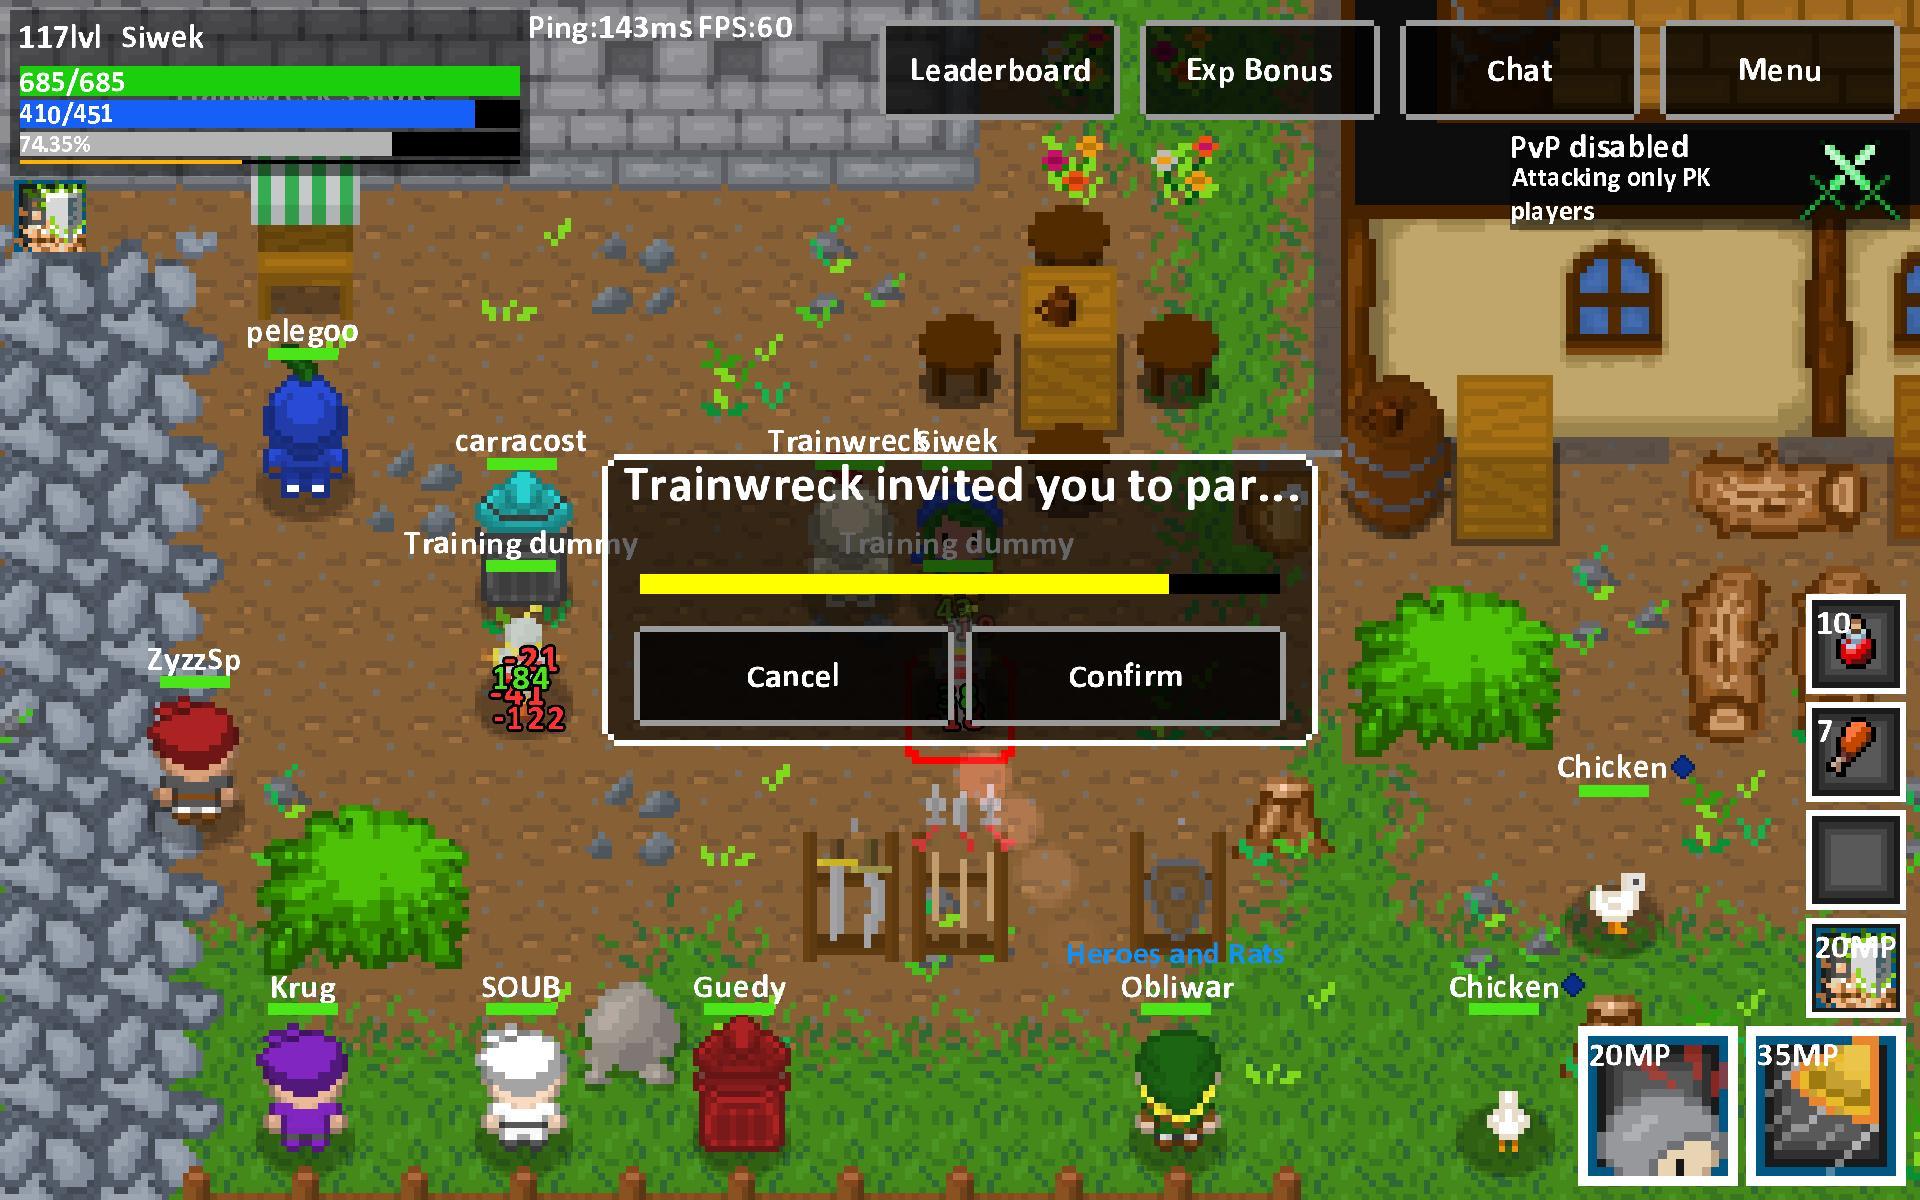 Heroes & Rats MMORPG Online 0.32.2 Screenshot 6